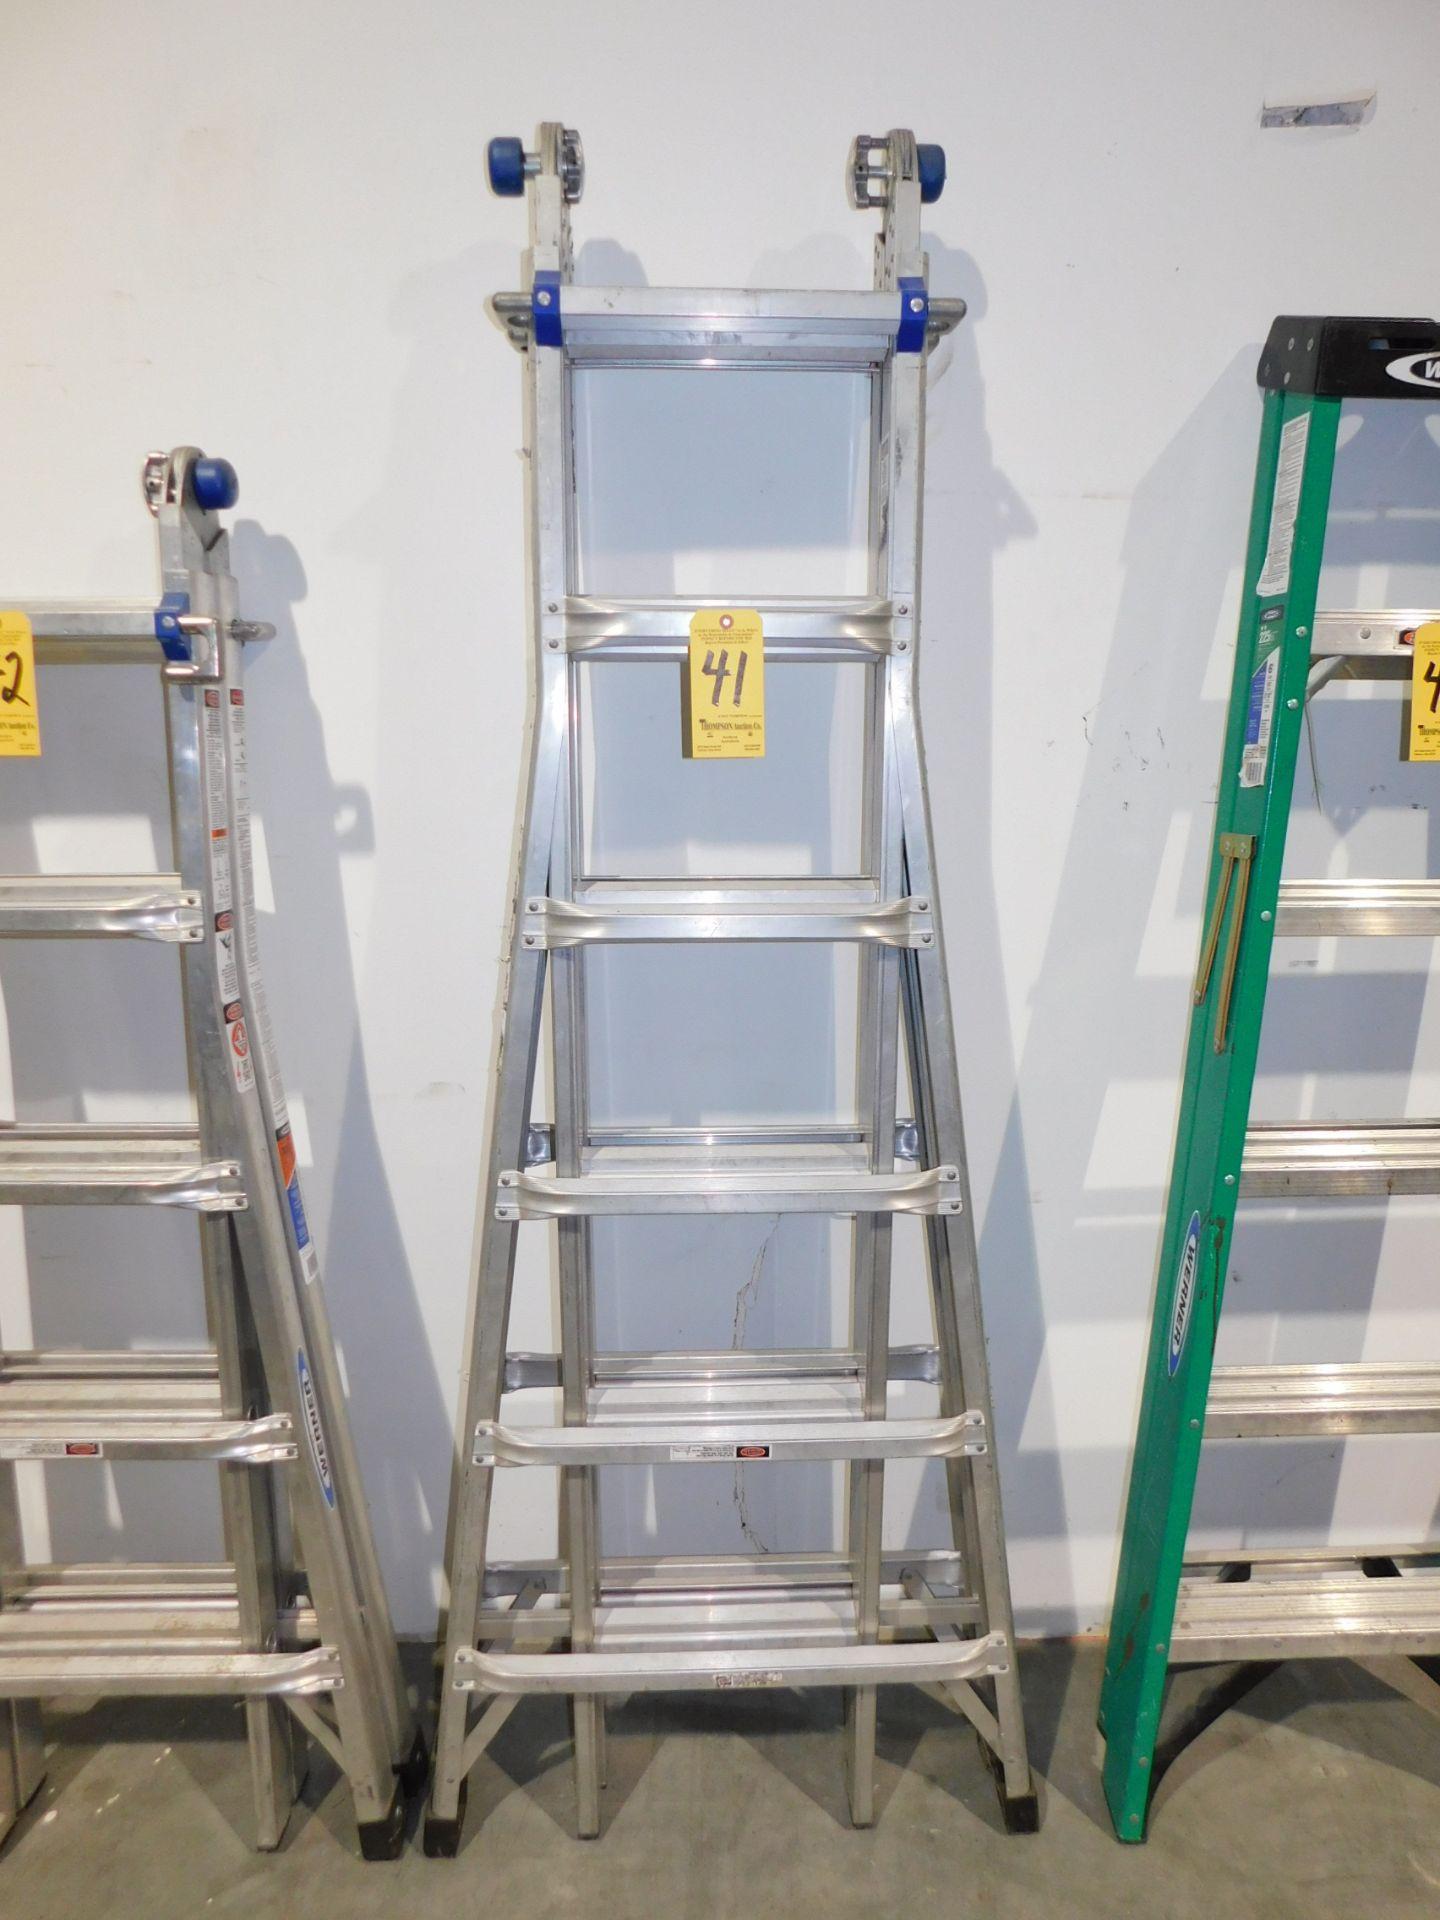 Lot 41 - Werner MT-26 Aluminum Ladder, 25' Reach